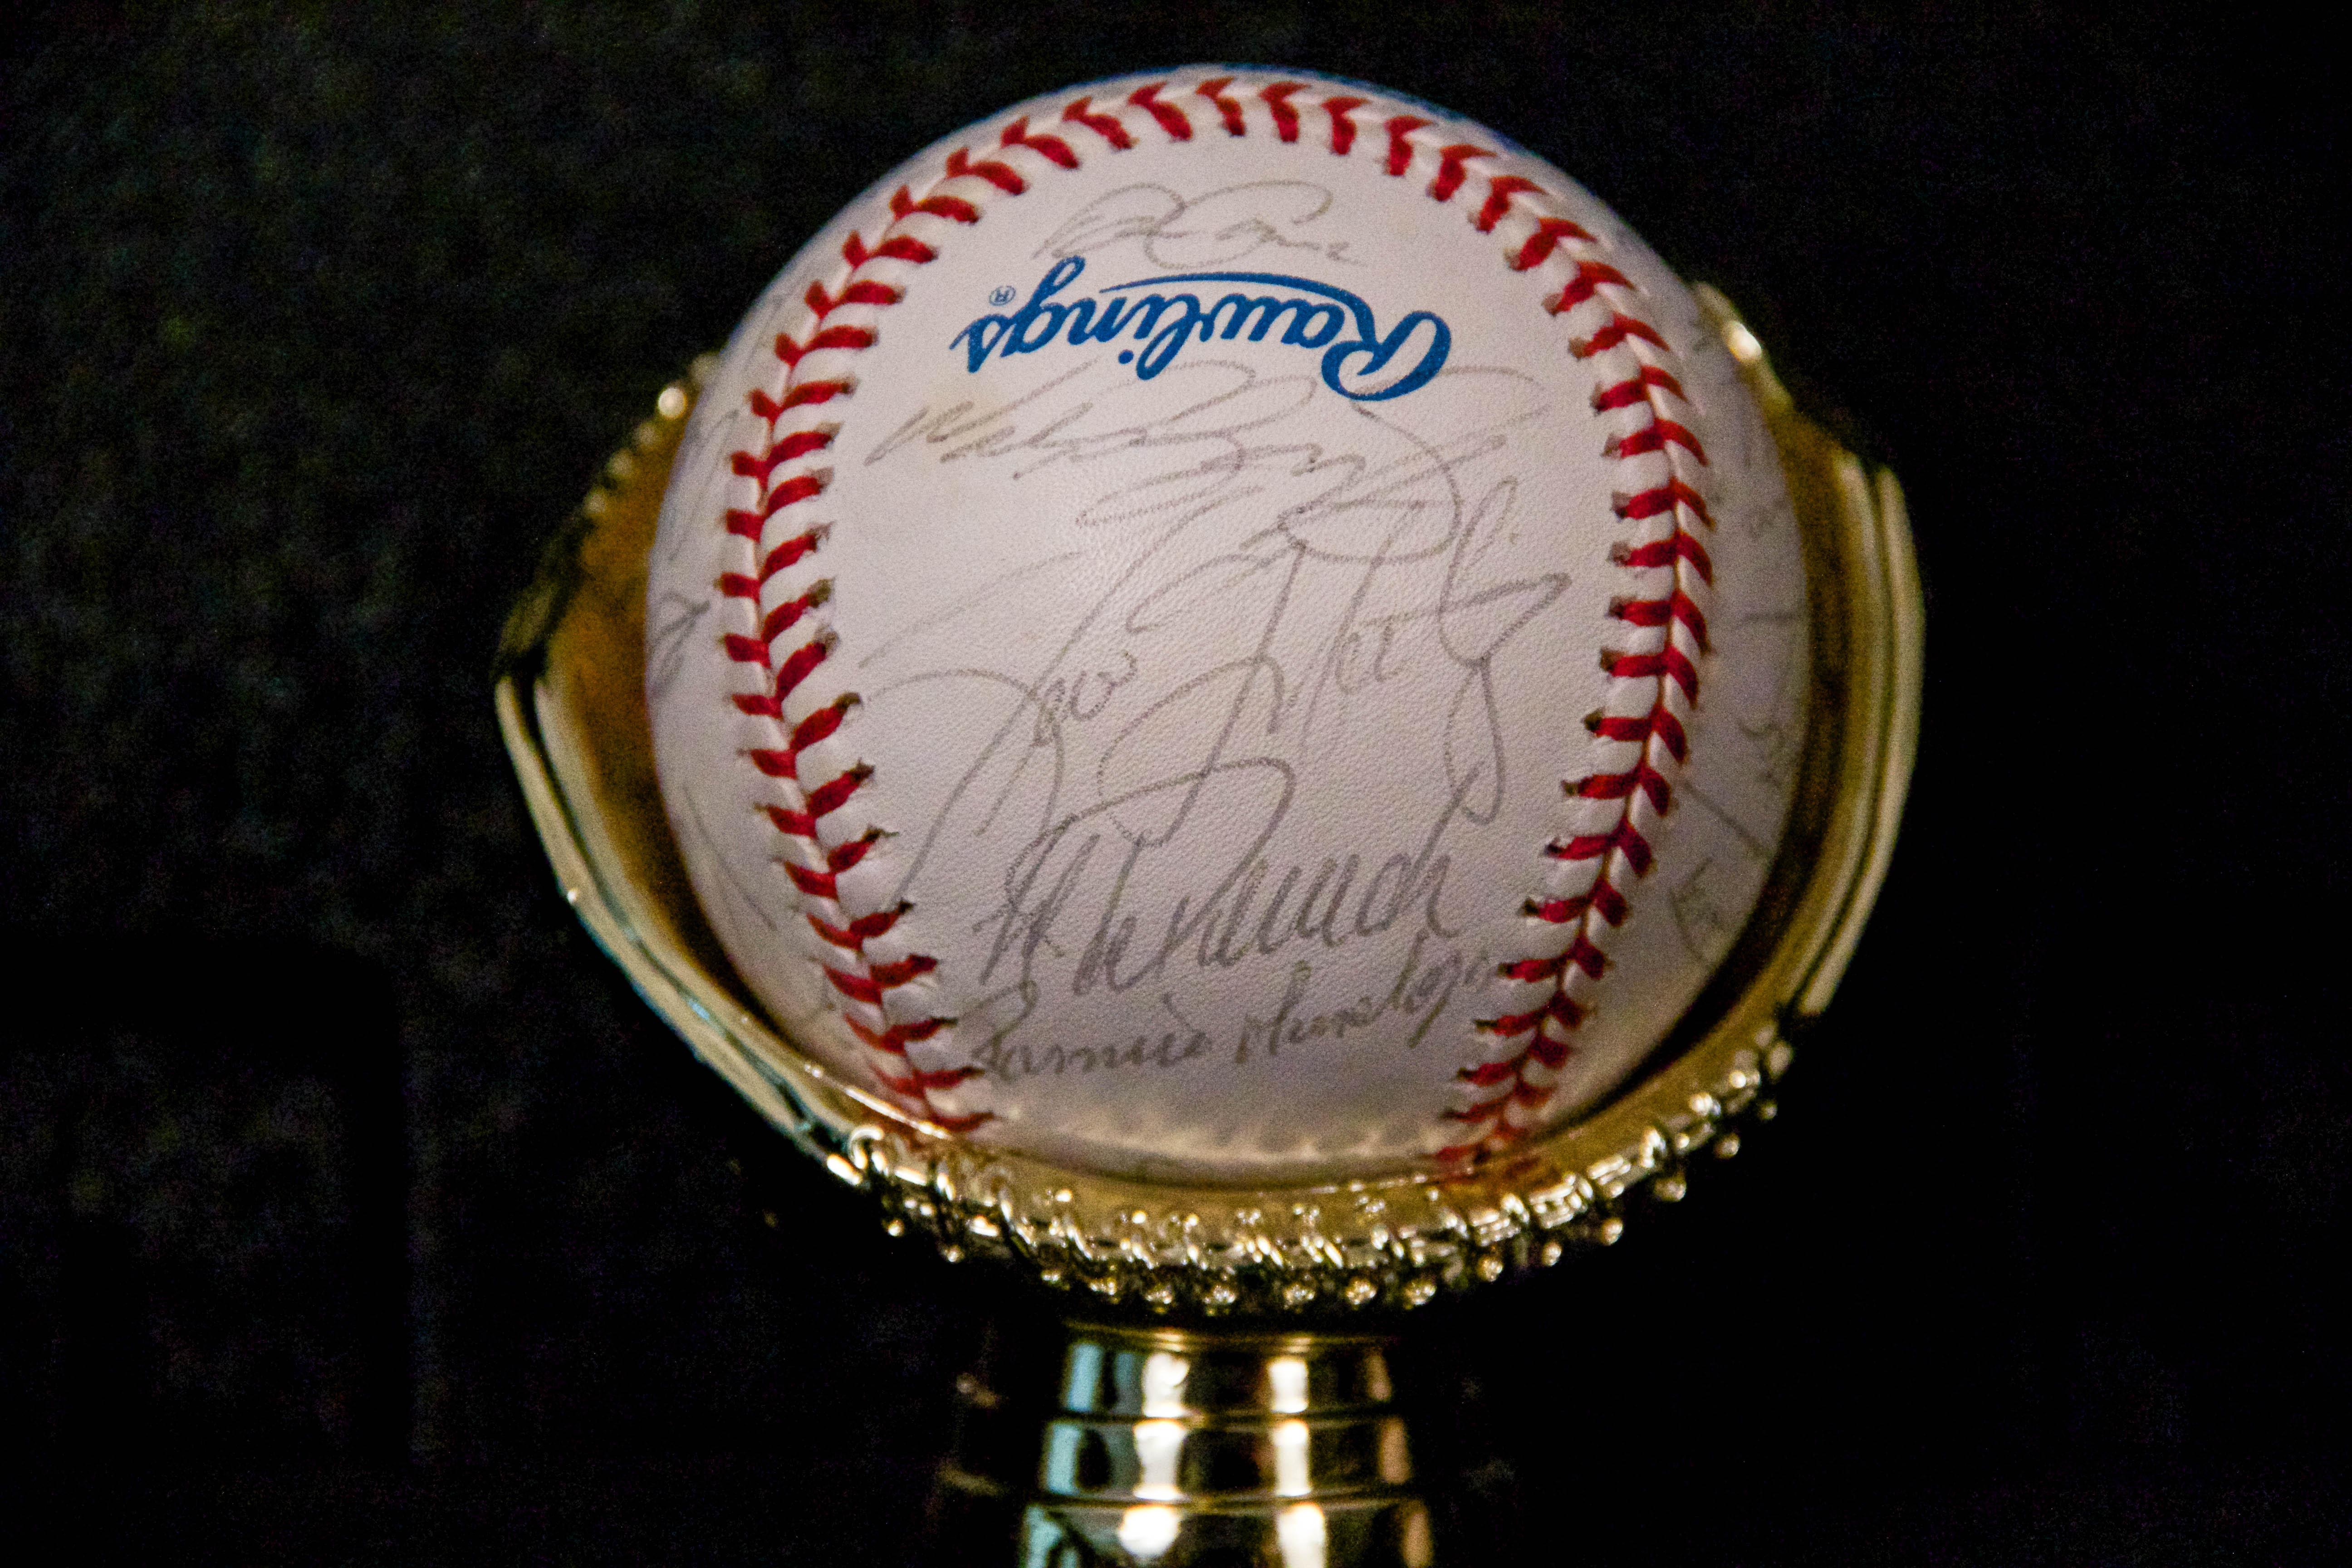 1998 World Series Champions